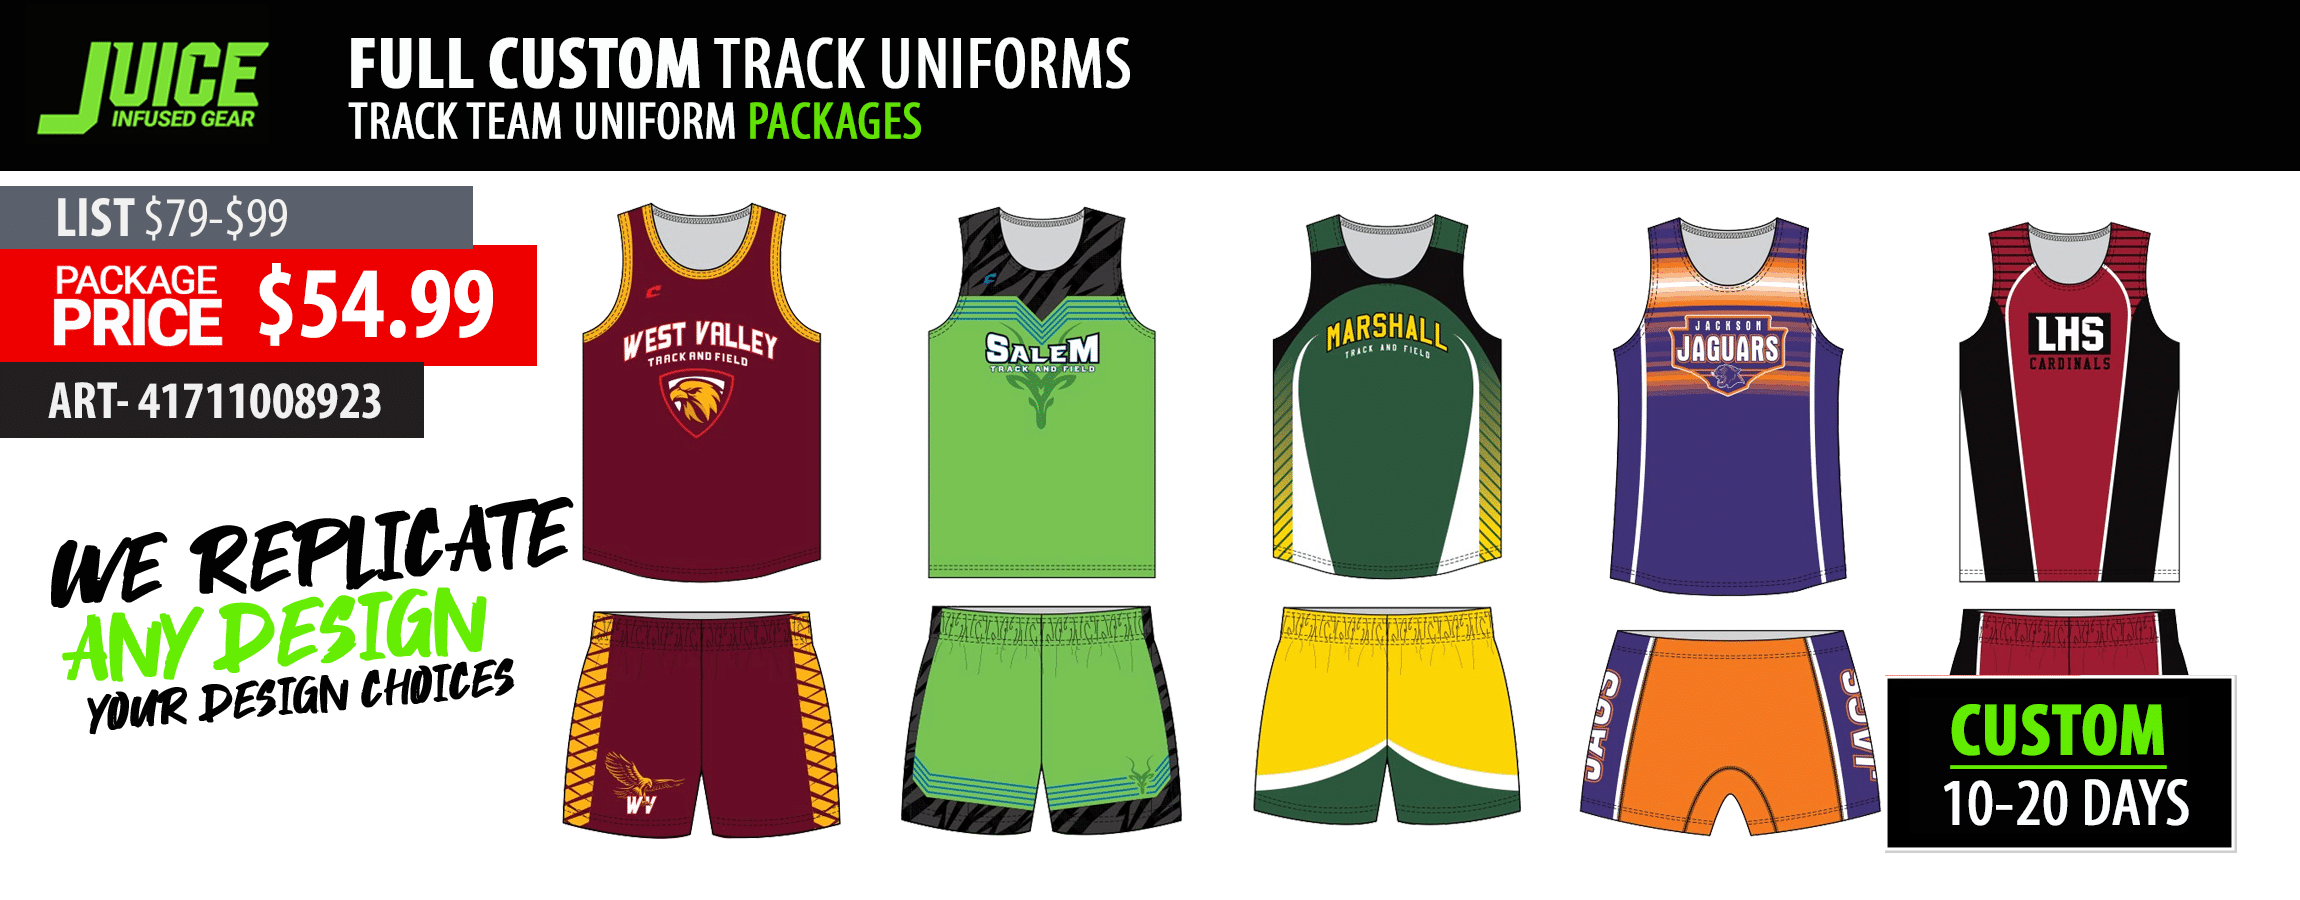 Track Team Uniform Packages | Women's